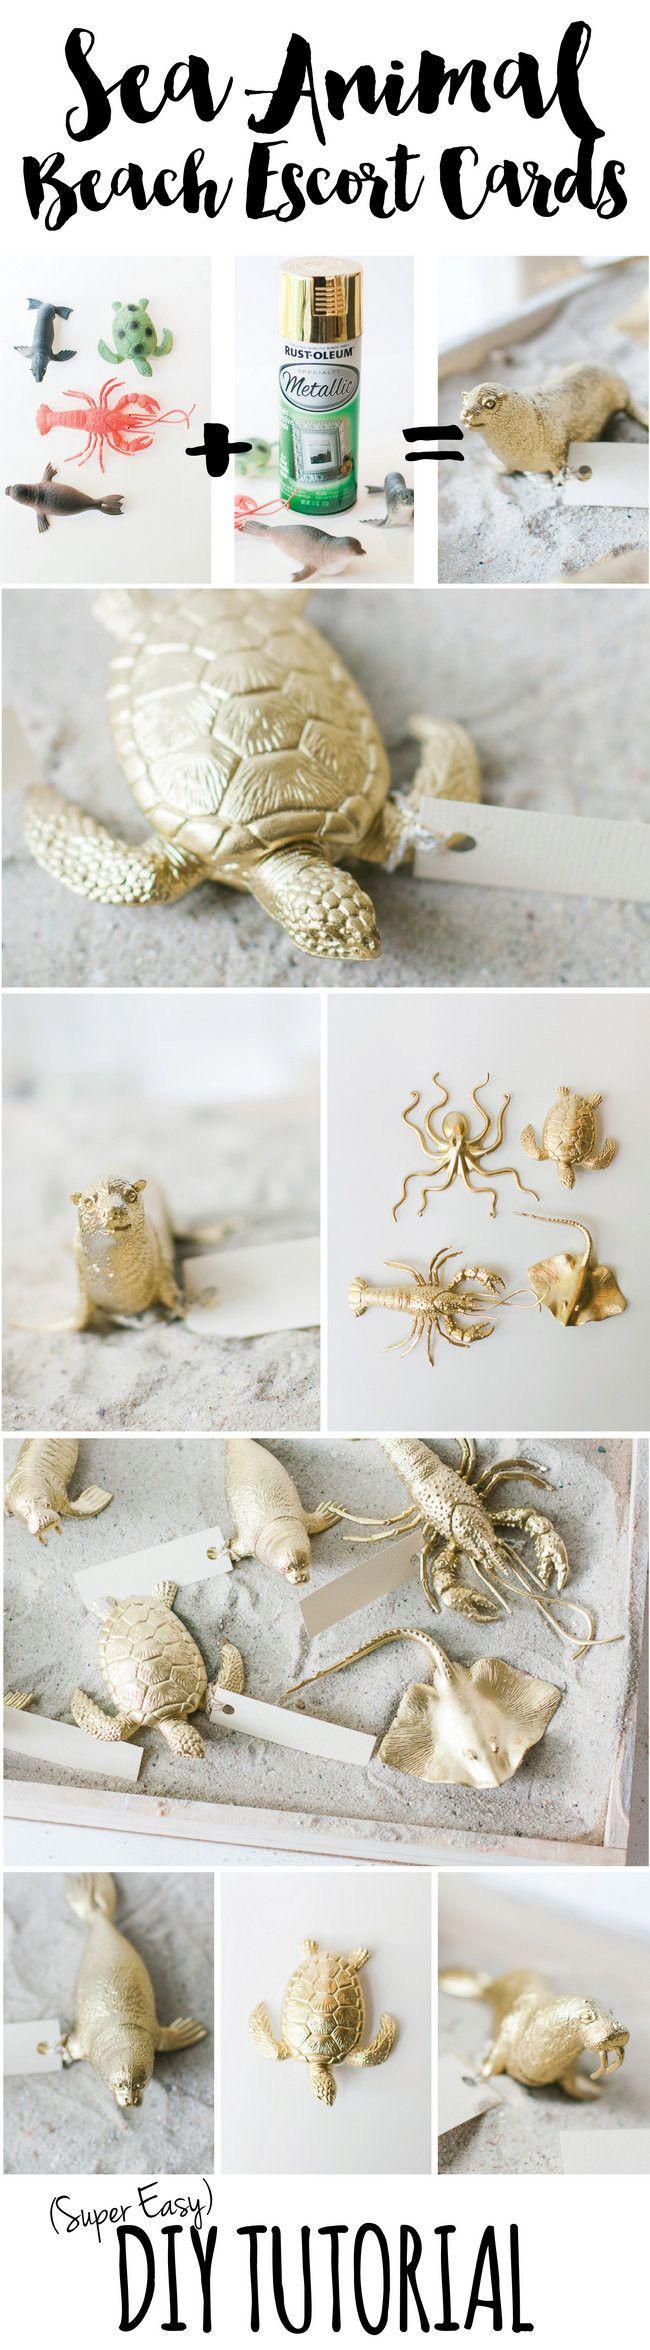 DIY Beach Wedding Escort Cards 4 (2)